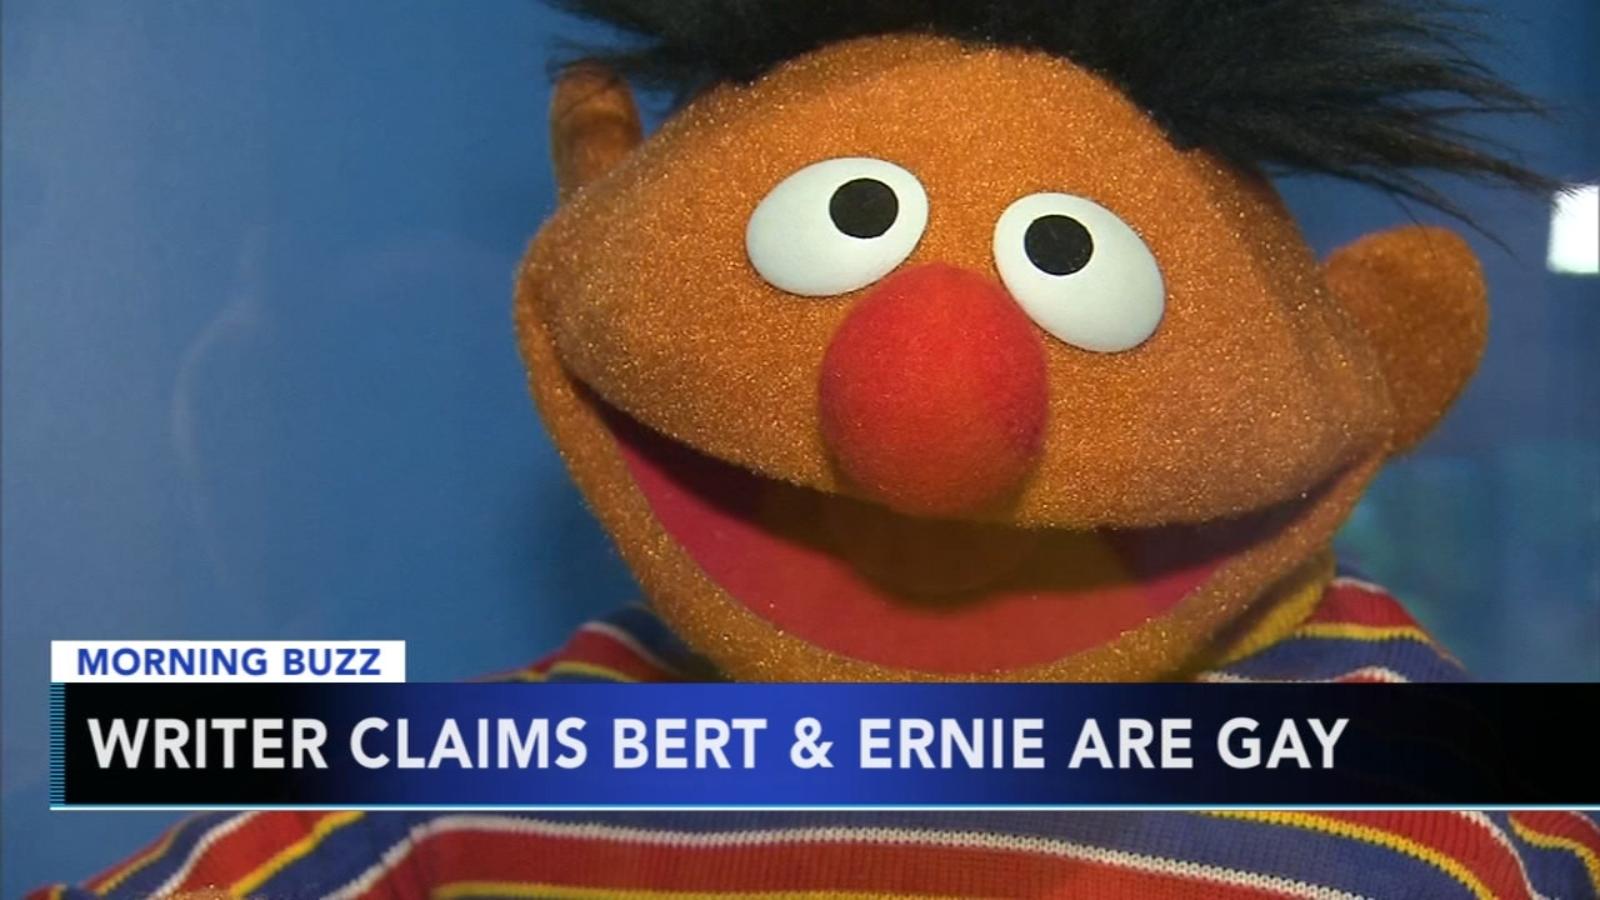 bert & ernie are gay